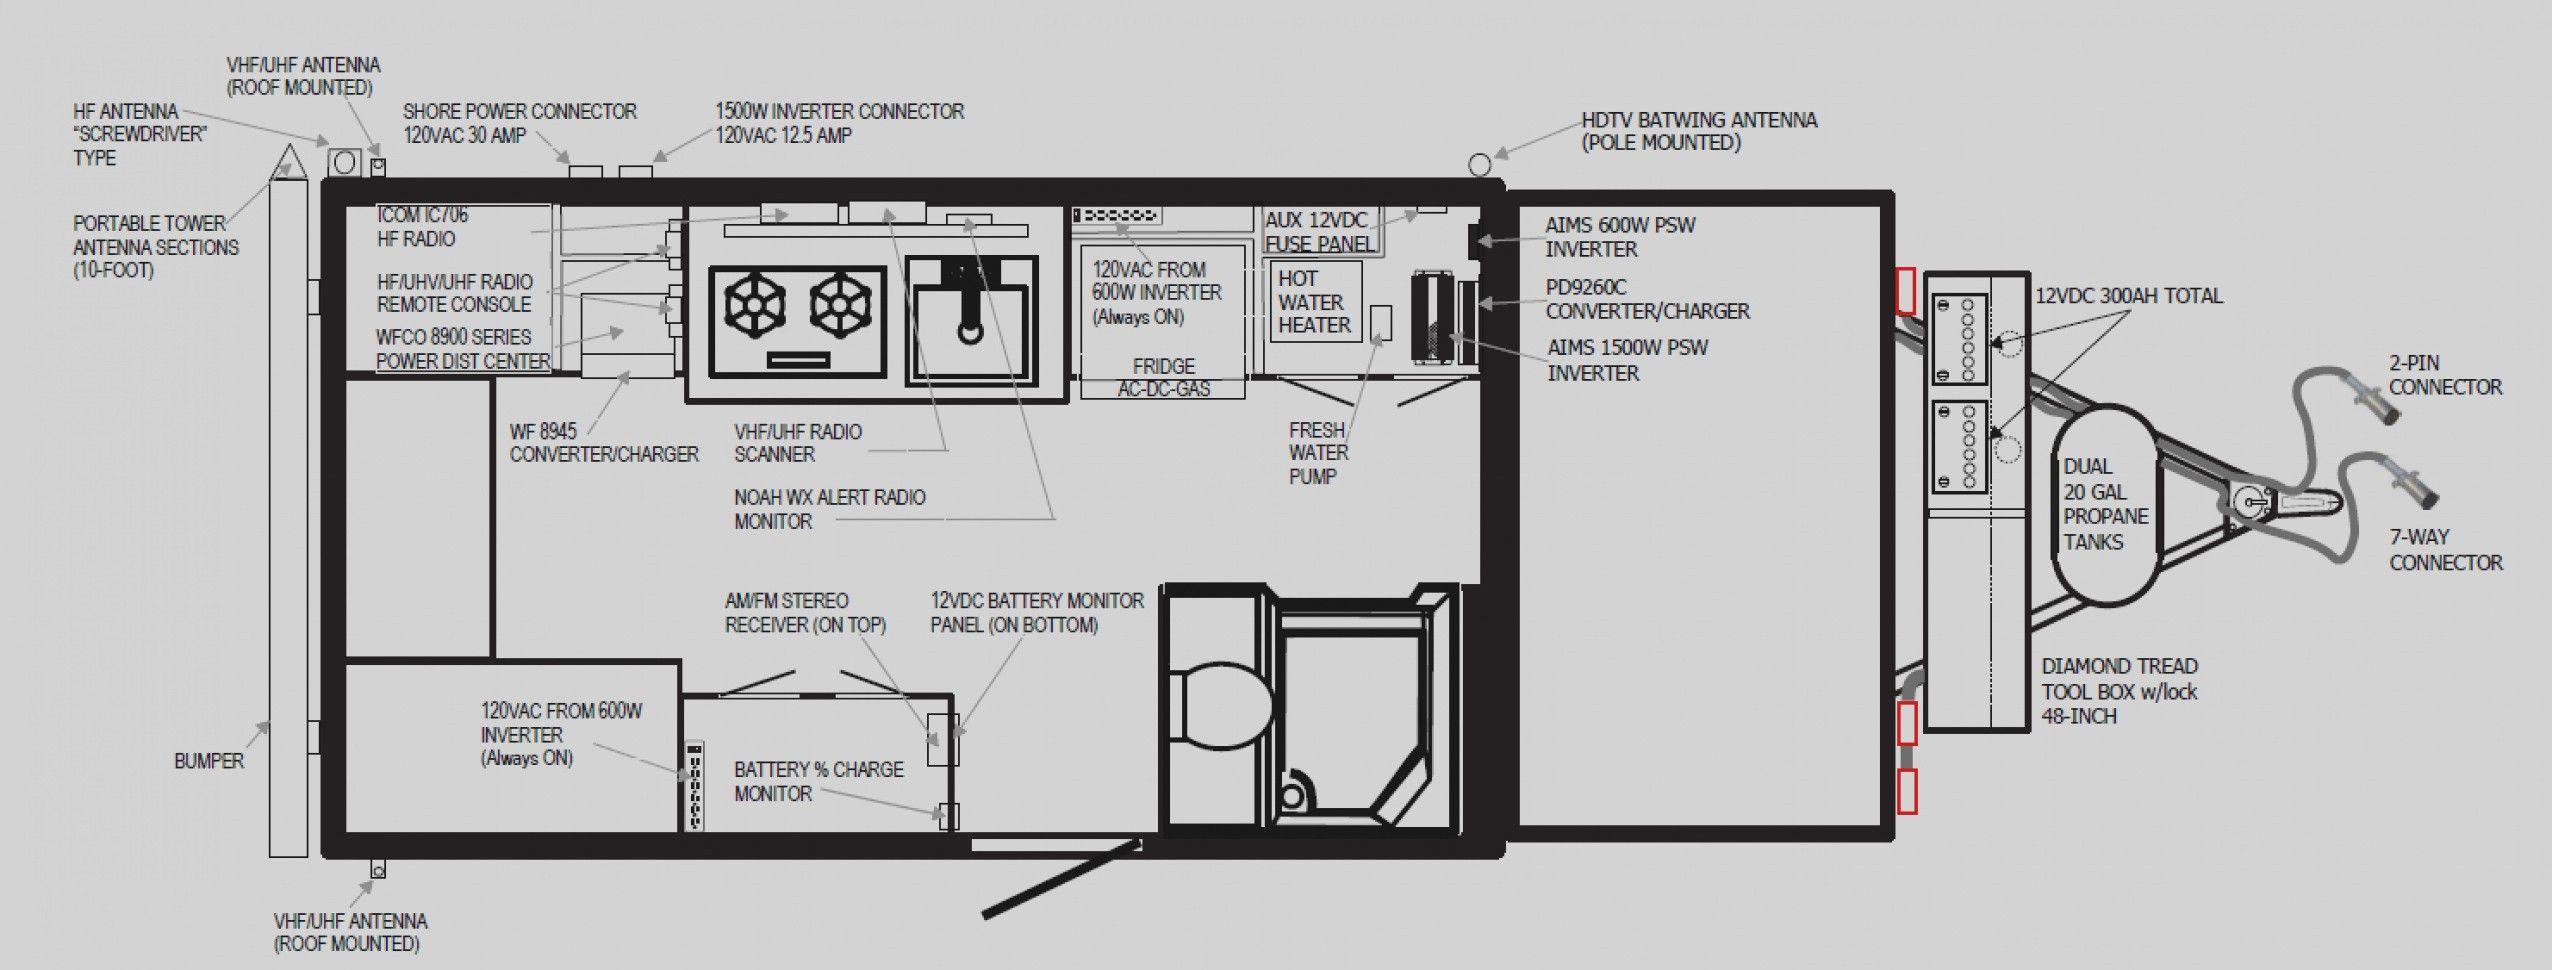 Coleman Pop Up Camper Fuse Box - Center Wiring Diagram live-canvas -  live-canvas.iosonointersex.itiosonointersex.it